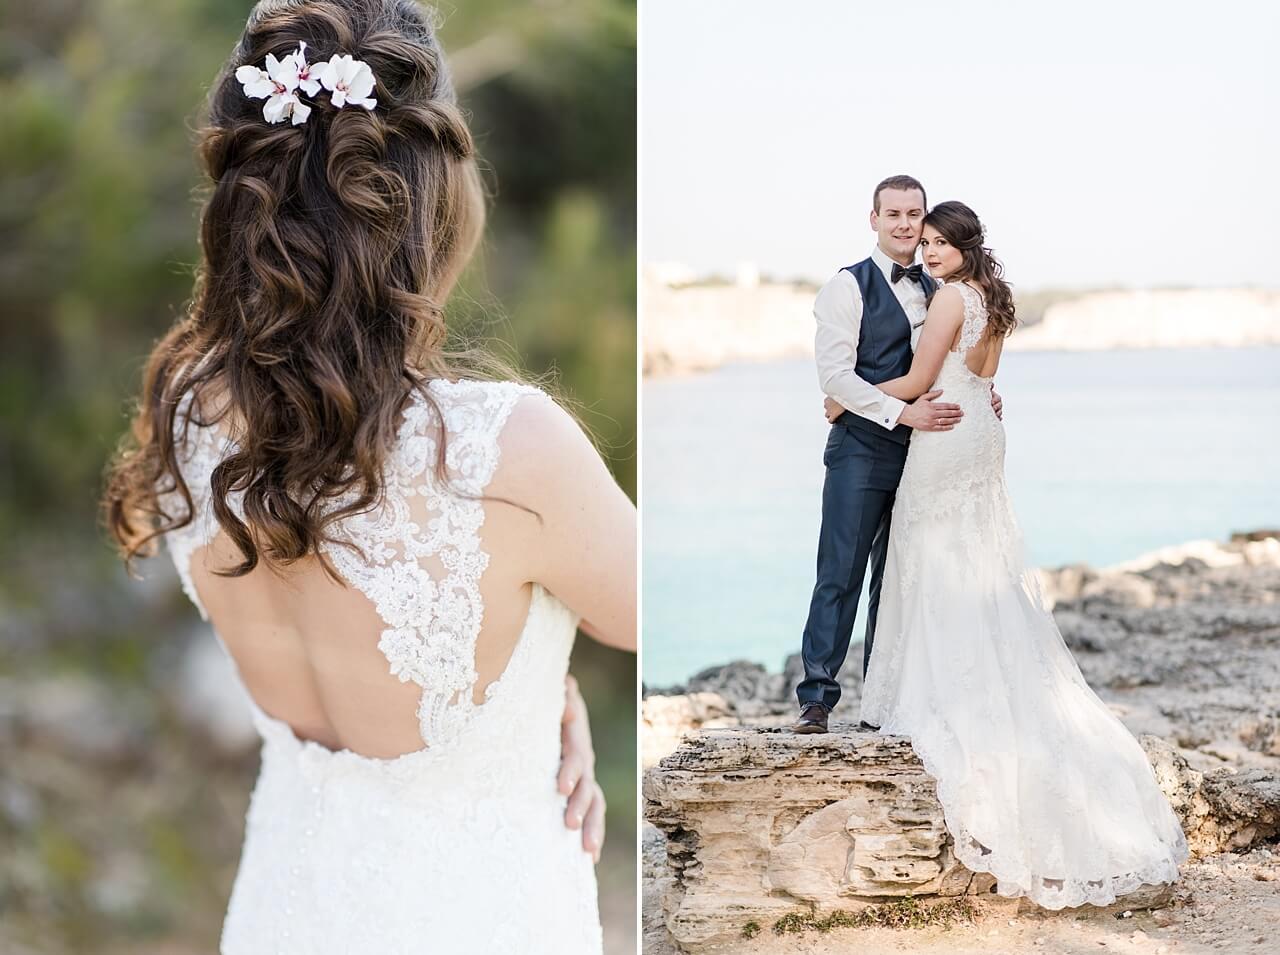 Rebecca Conte Fotografie: After Wedding Shoot Mallorca 15